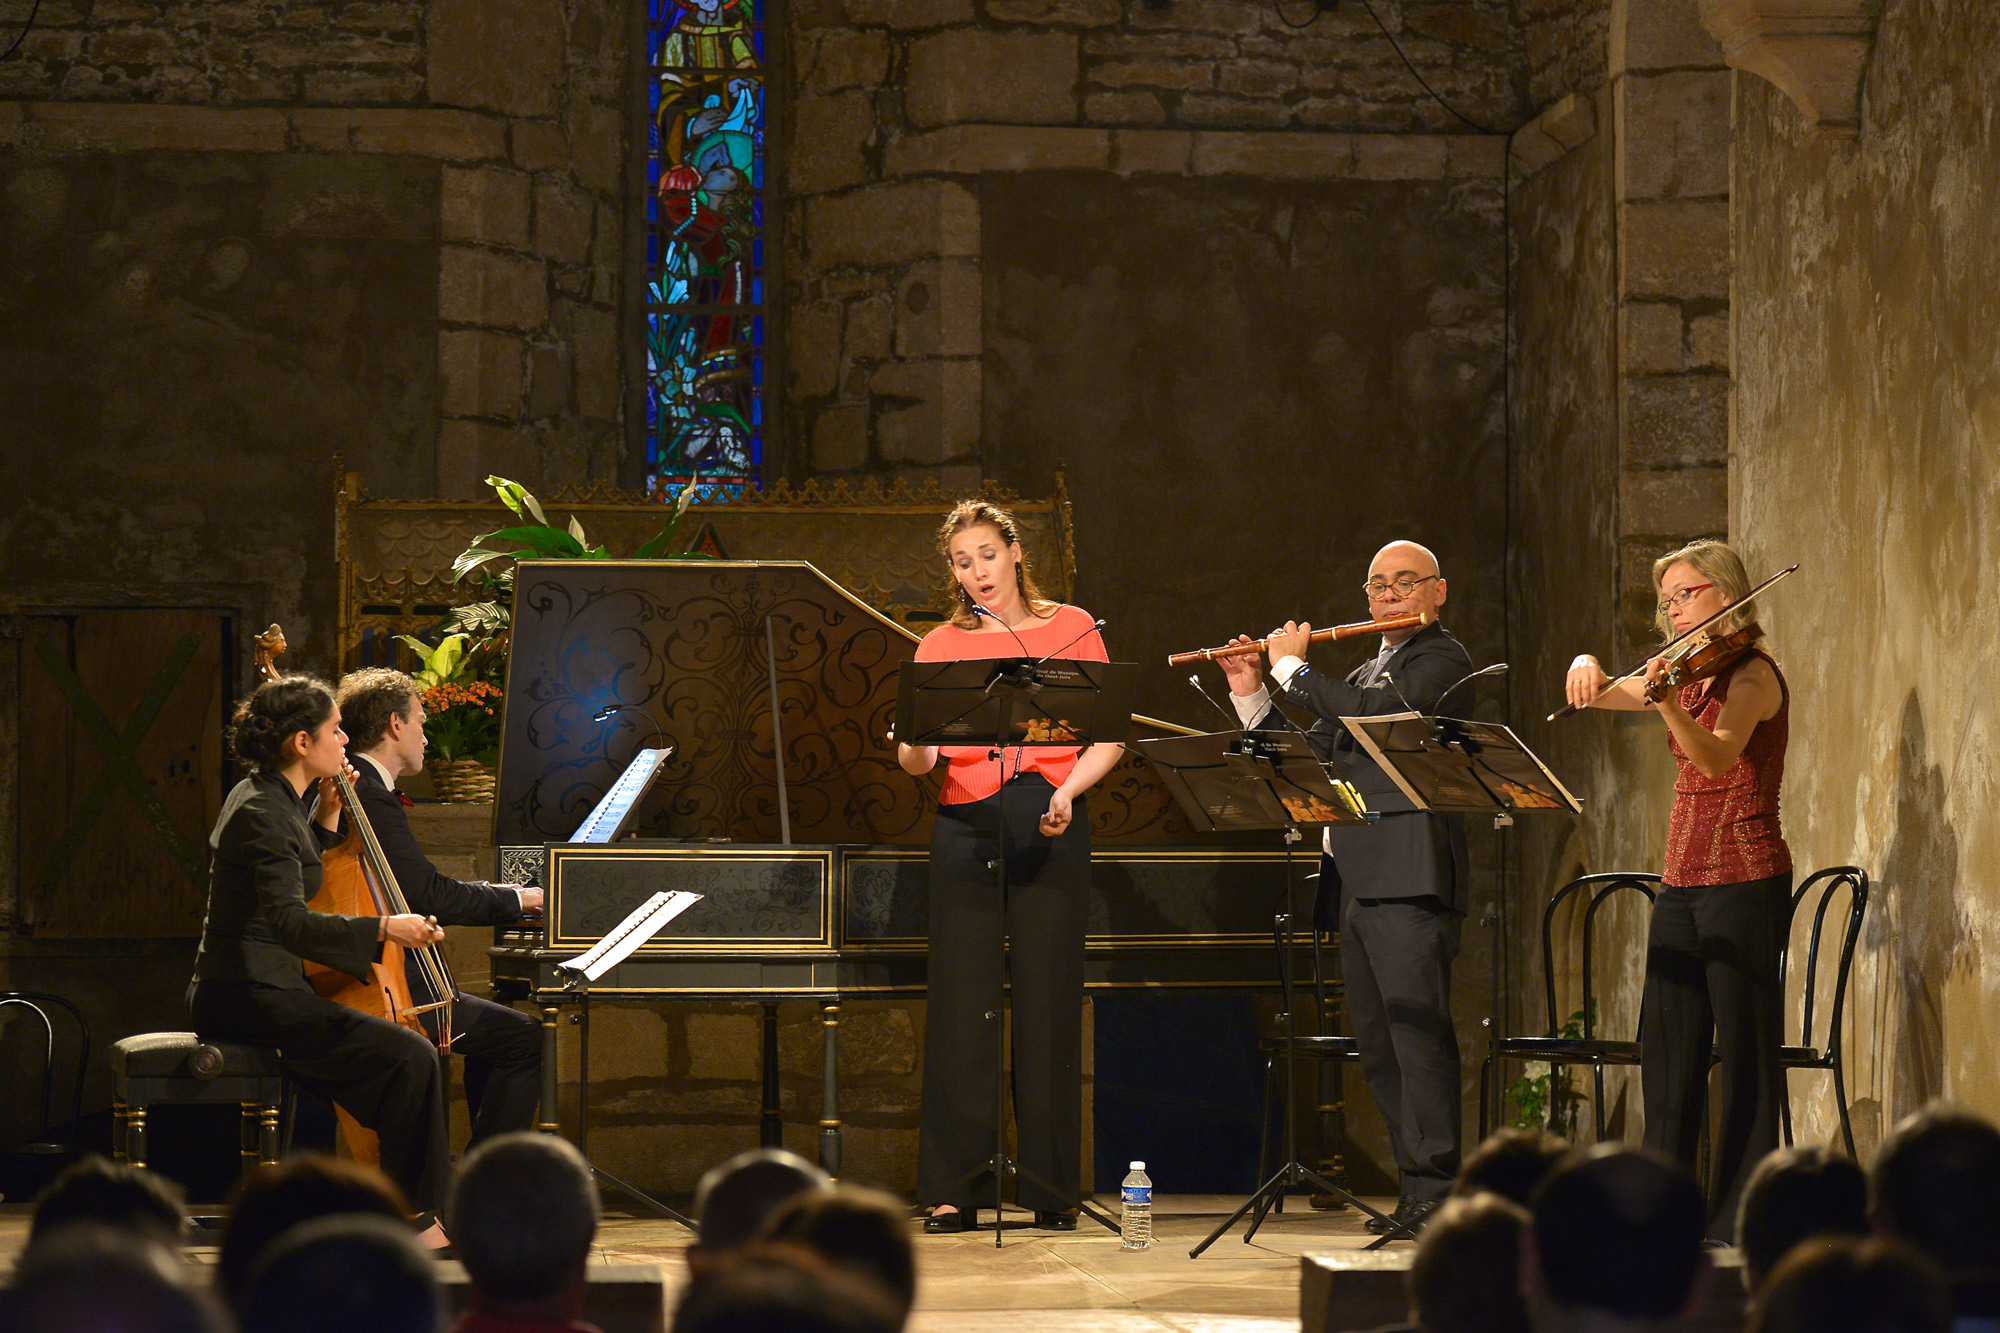 http://www.festival-musique-baroque-jura.com/wp-content/uploads/2017/03/JCB2015-06-07-61.jpg